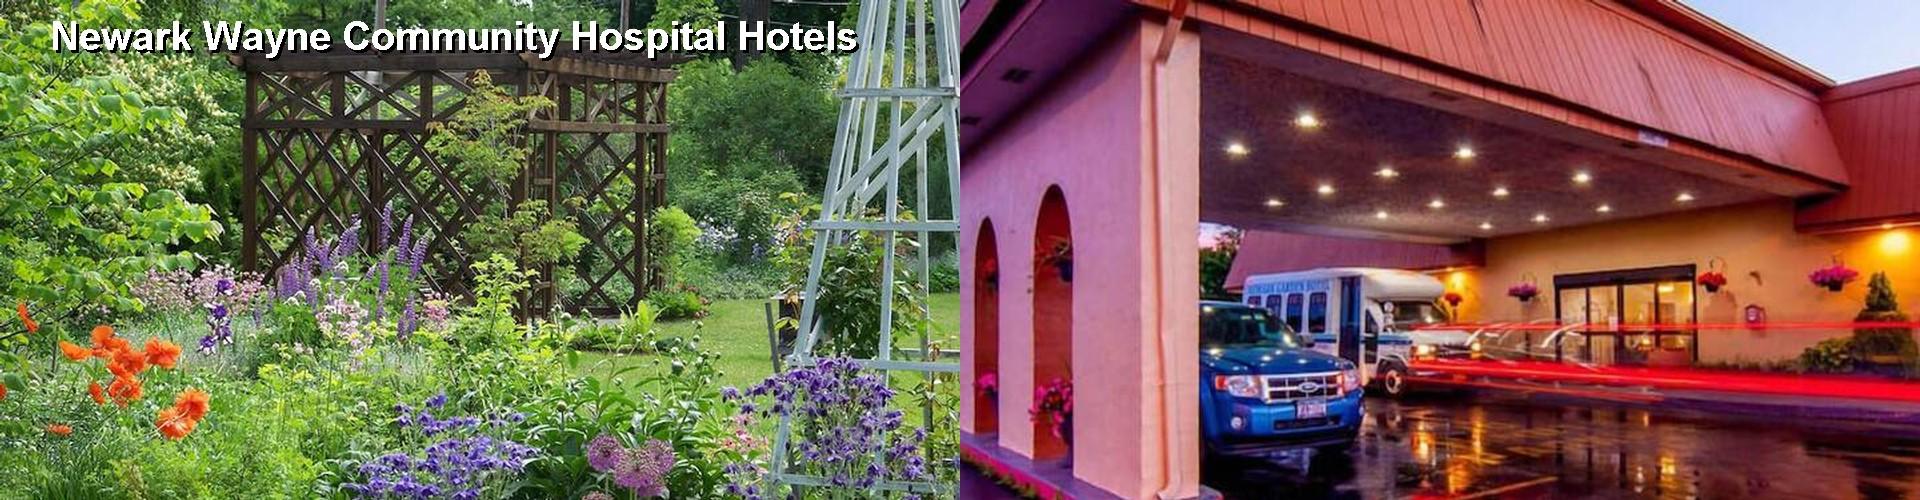 5 Best Hotels Near Newark Wayne Community Hospital